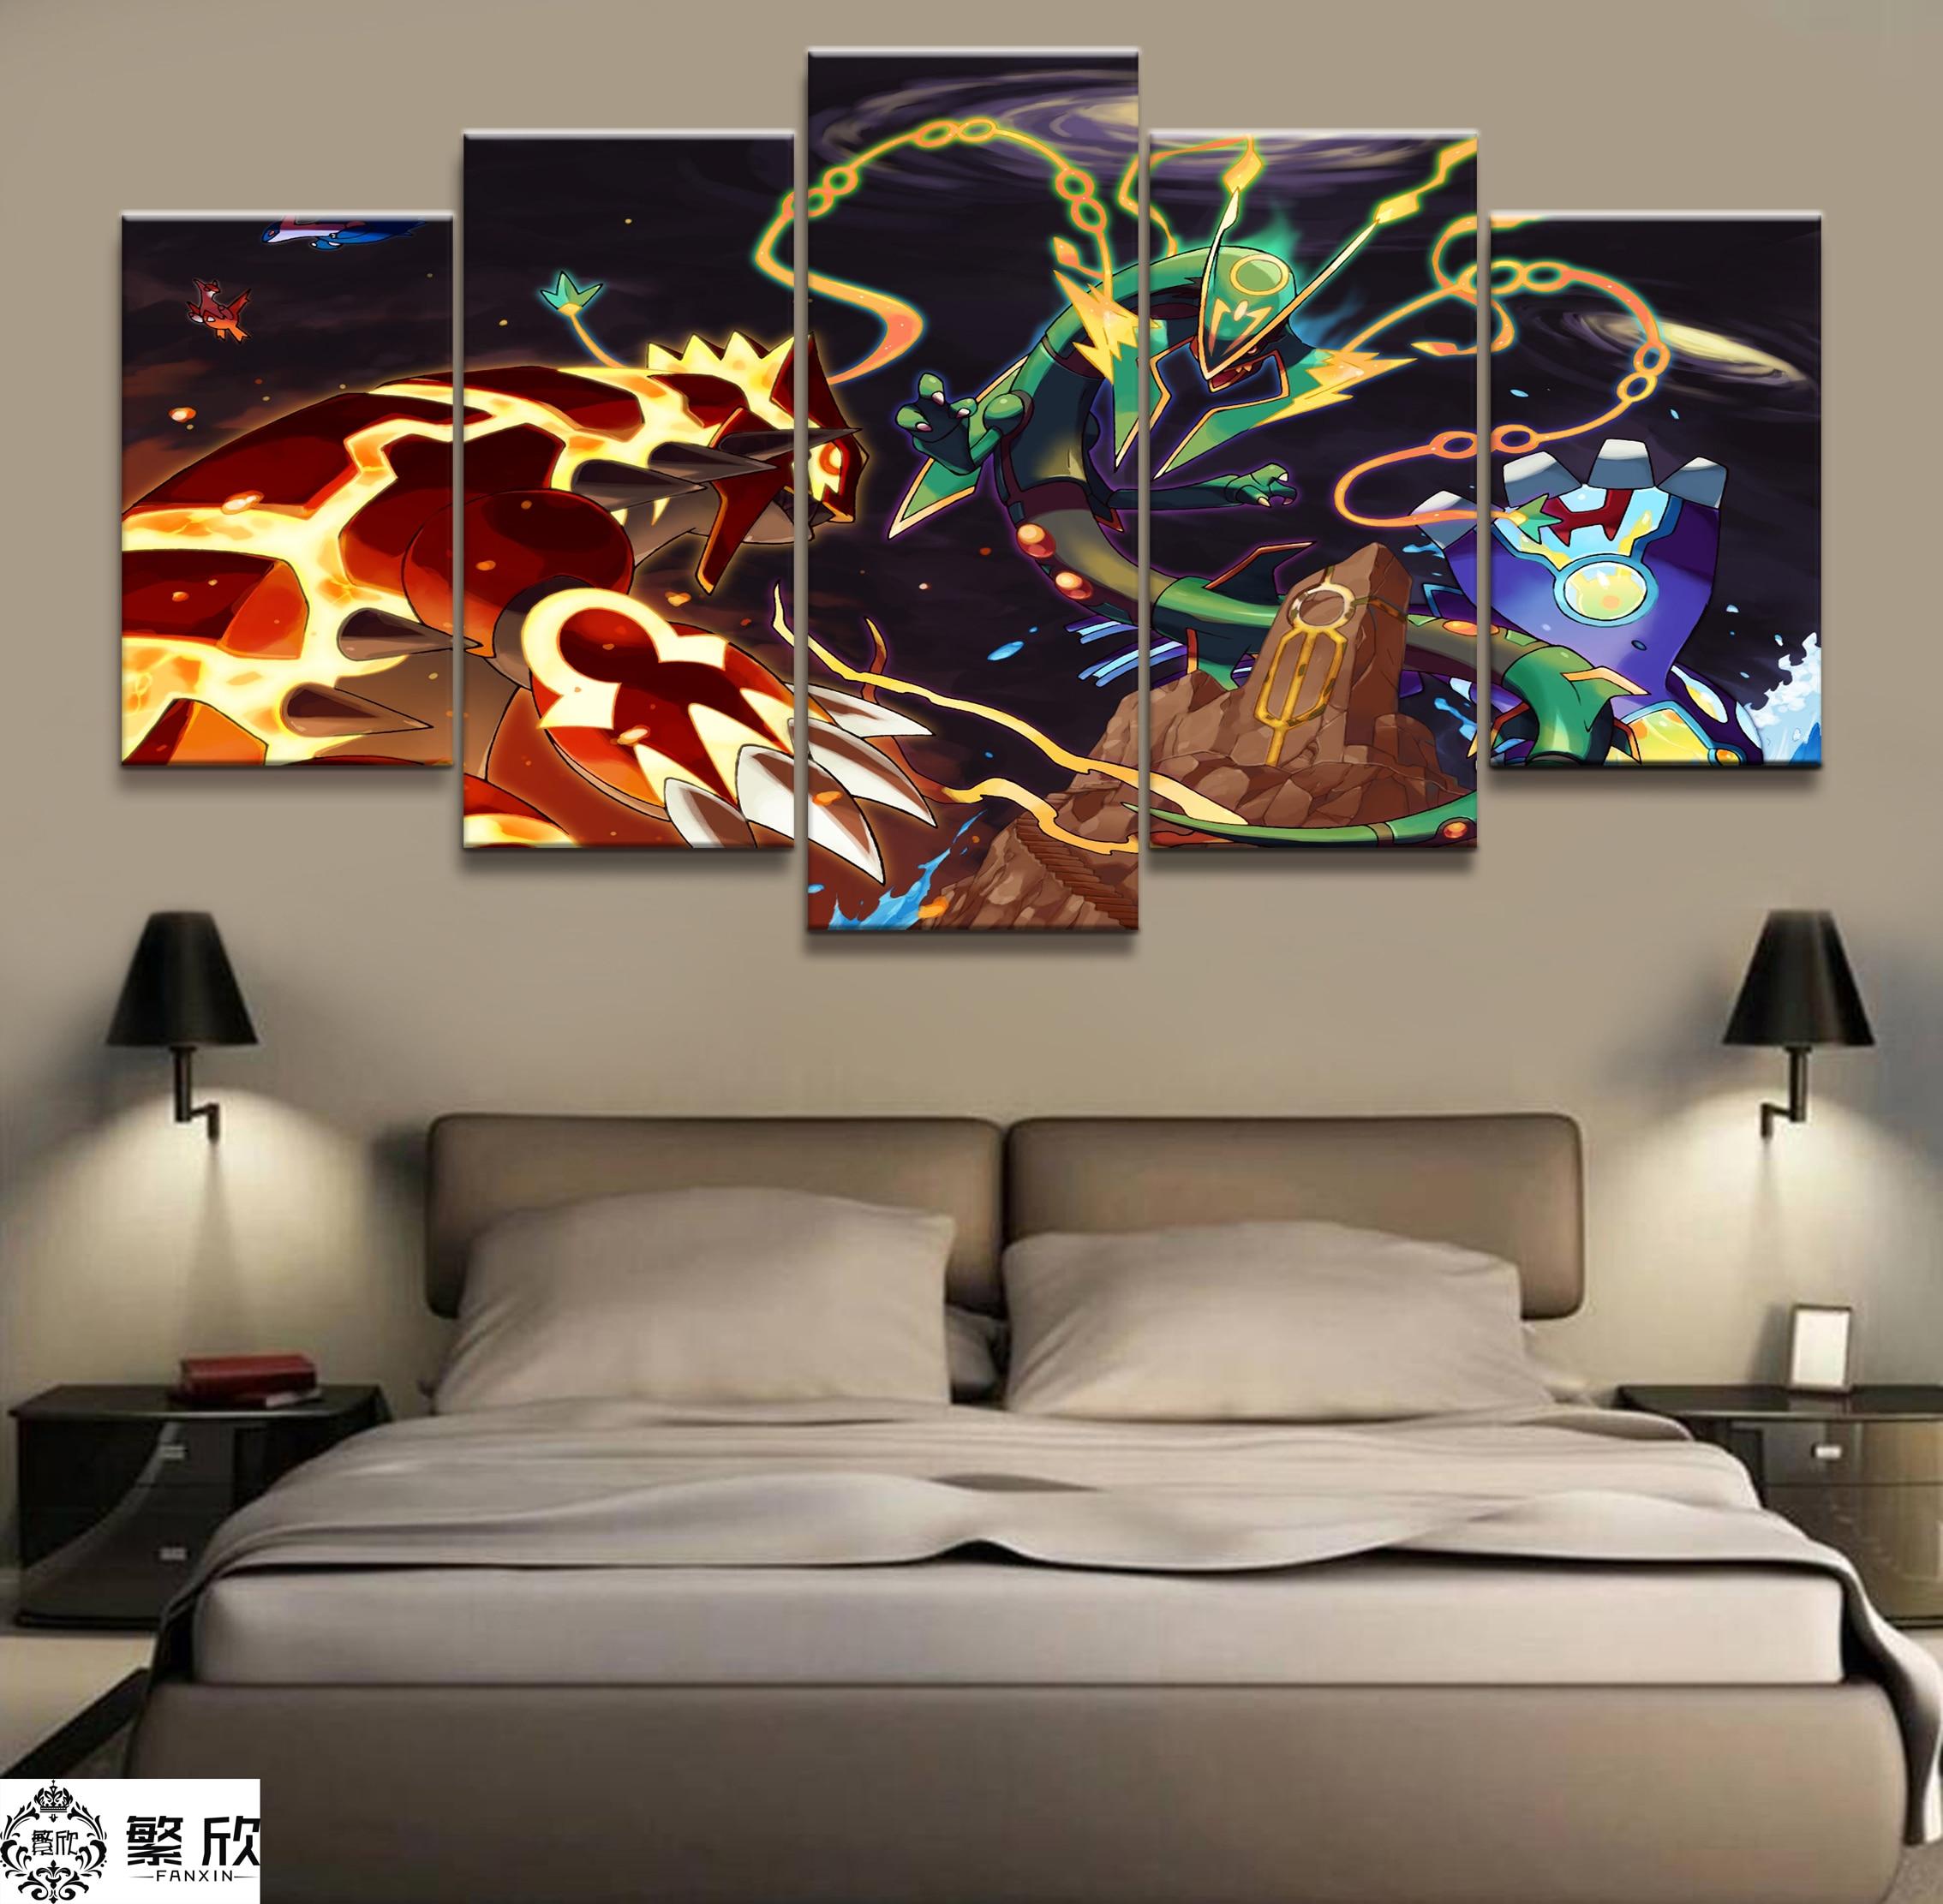 Classic Home Decor Pieces: Home Decor Painting Print 5 Piece Best Stylish Classic